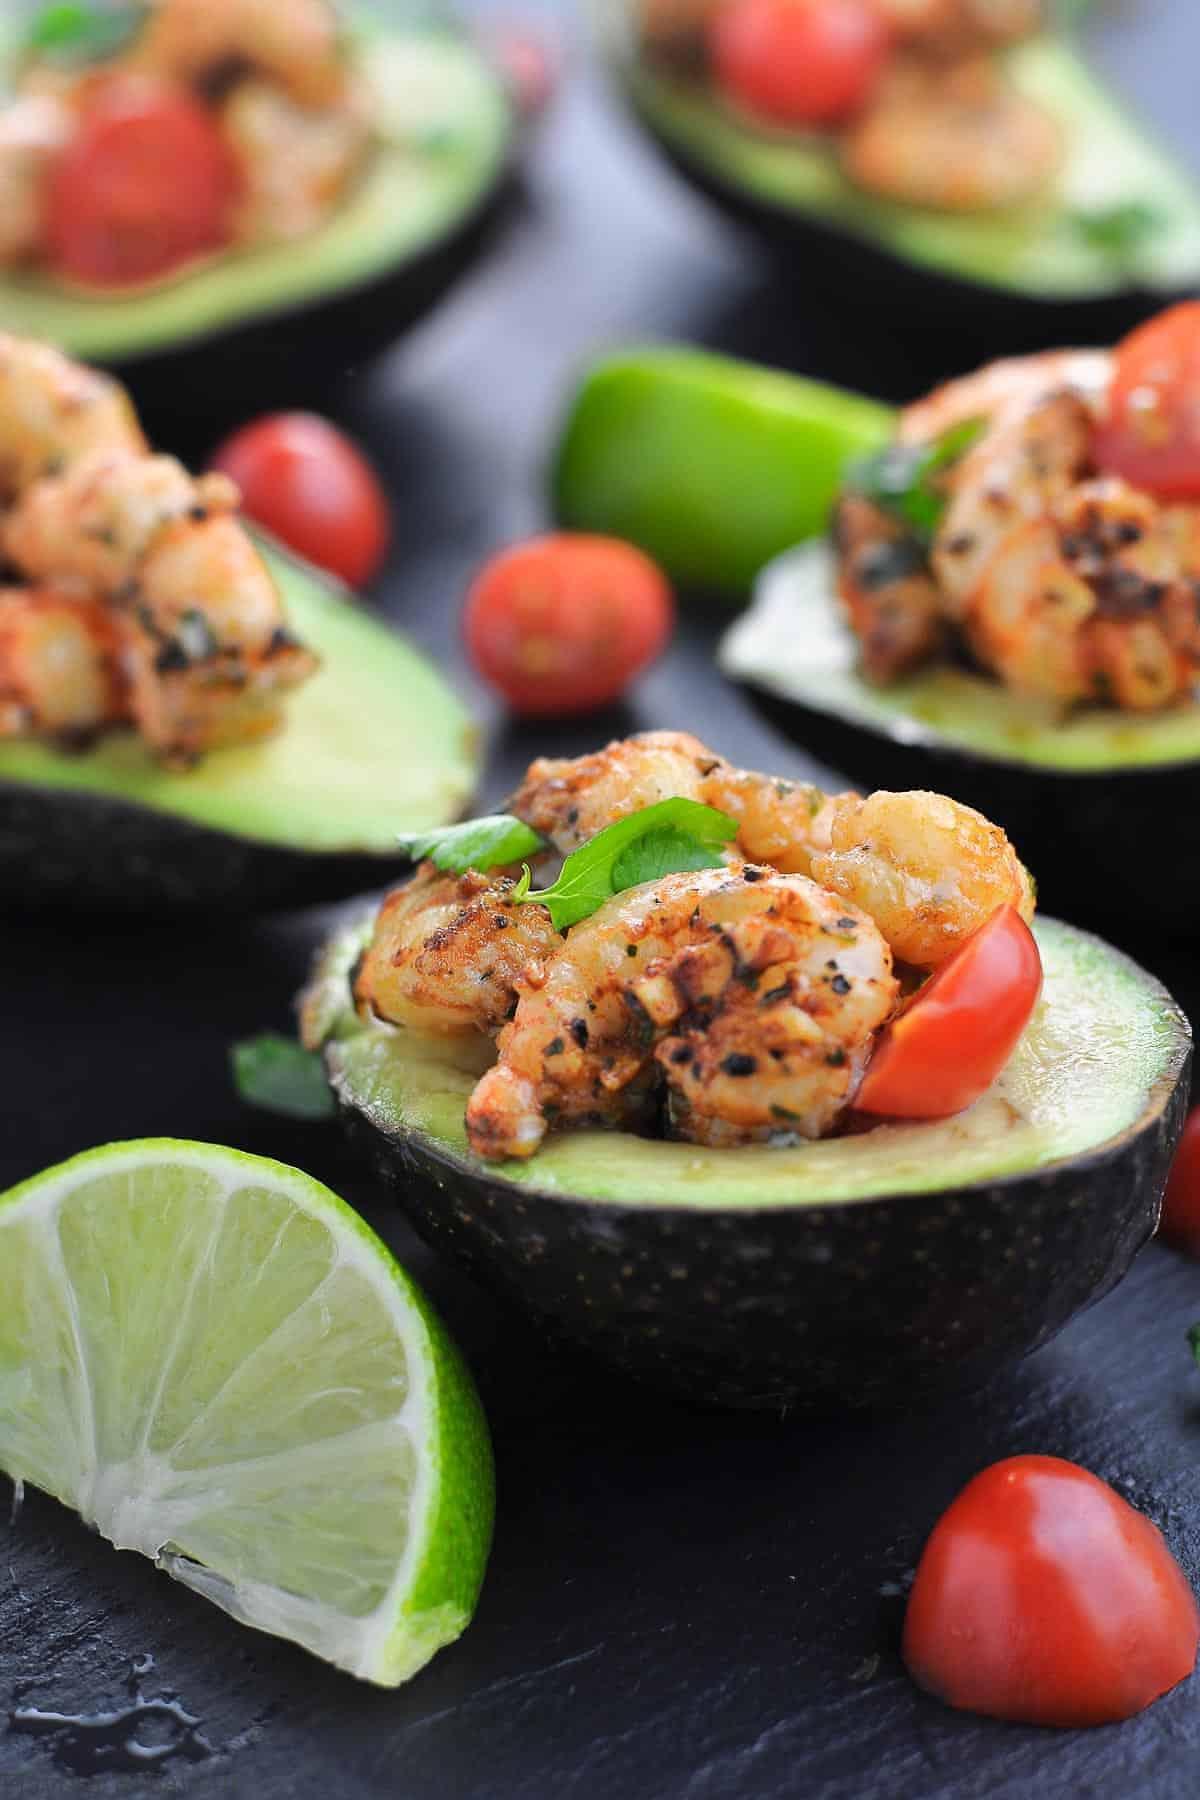 Cajun Shrimp Stuffed Avocados with quartered limes on a black tray